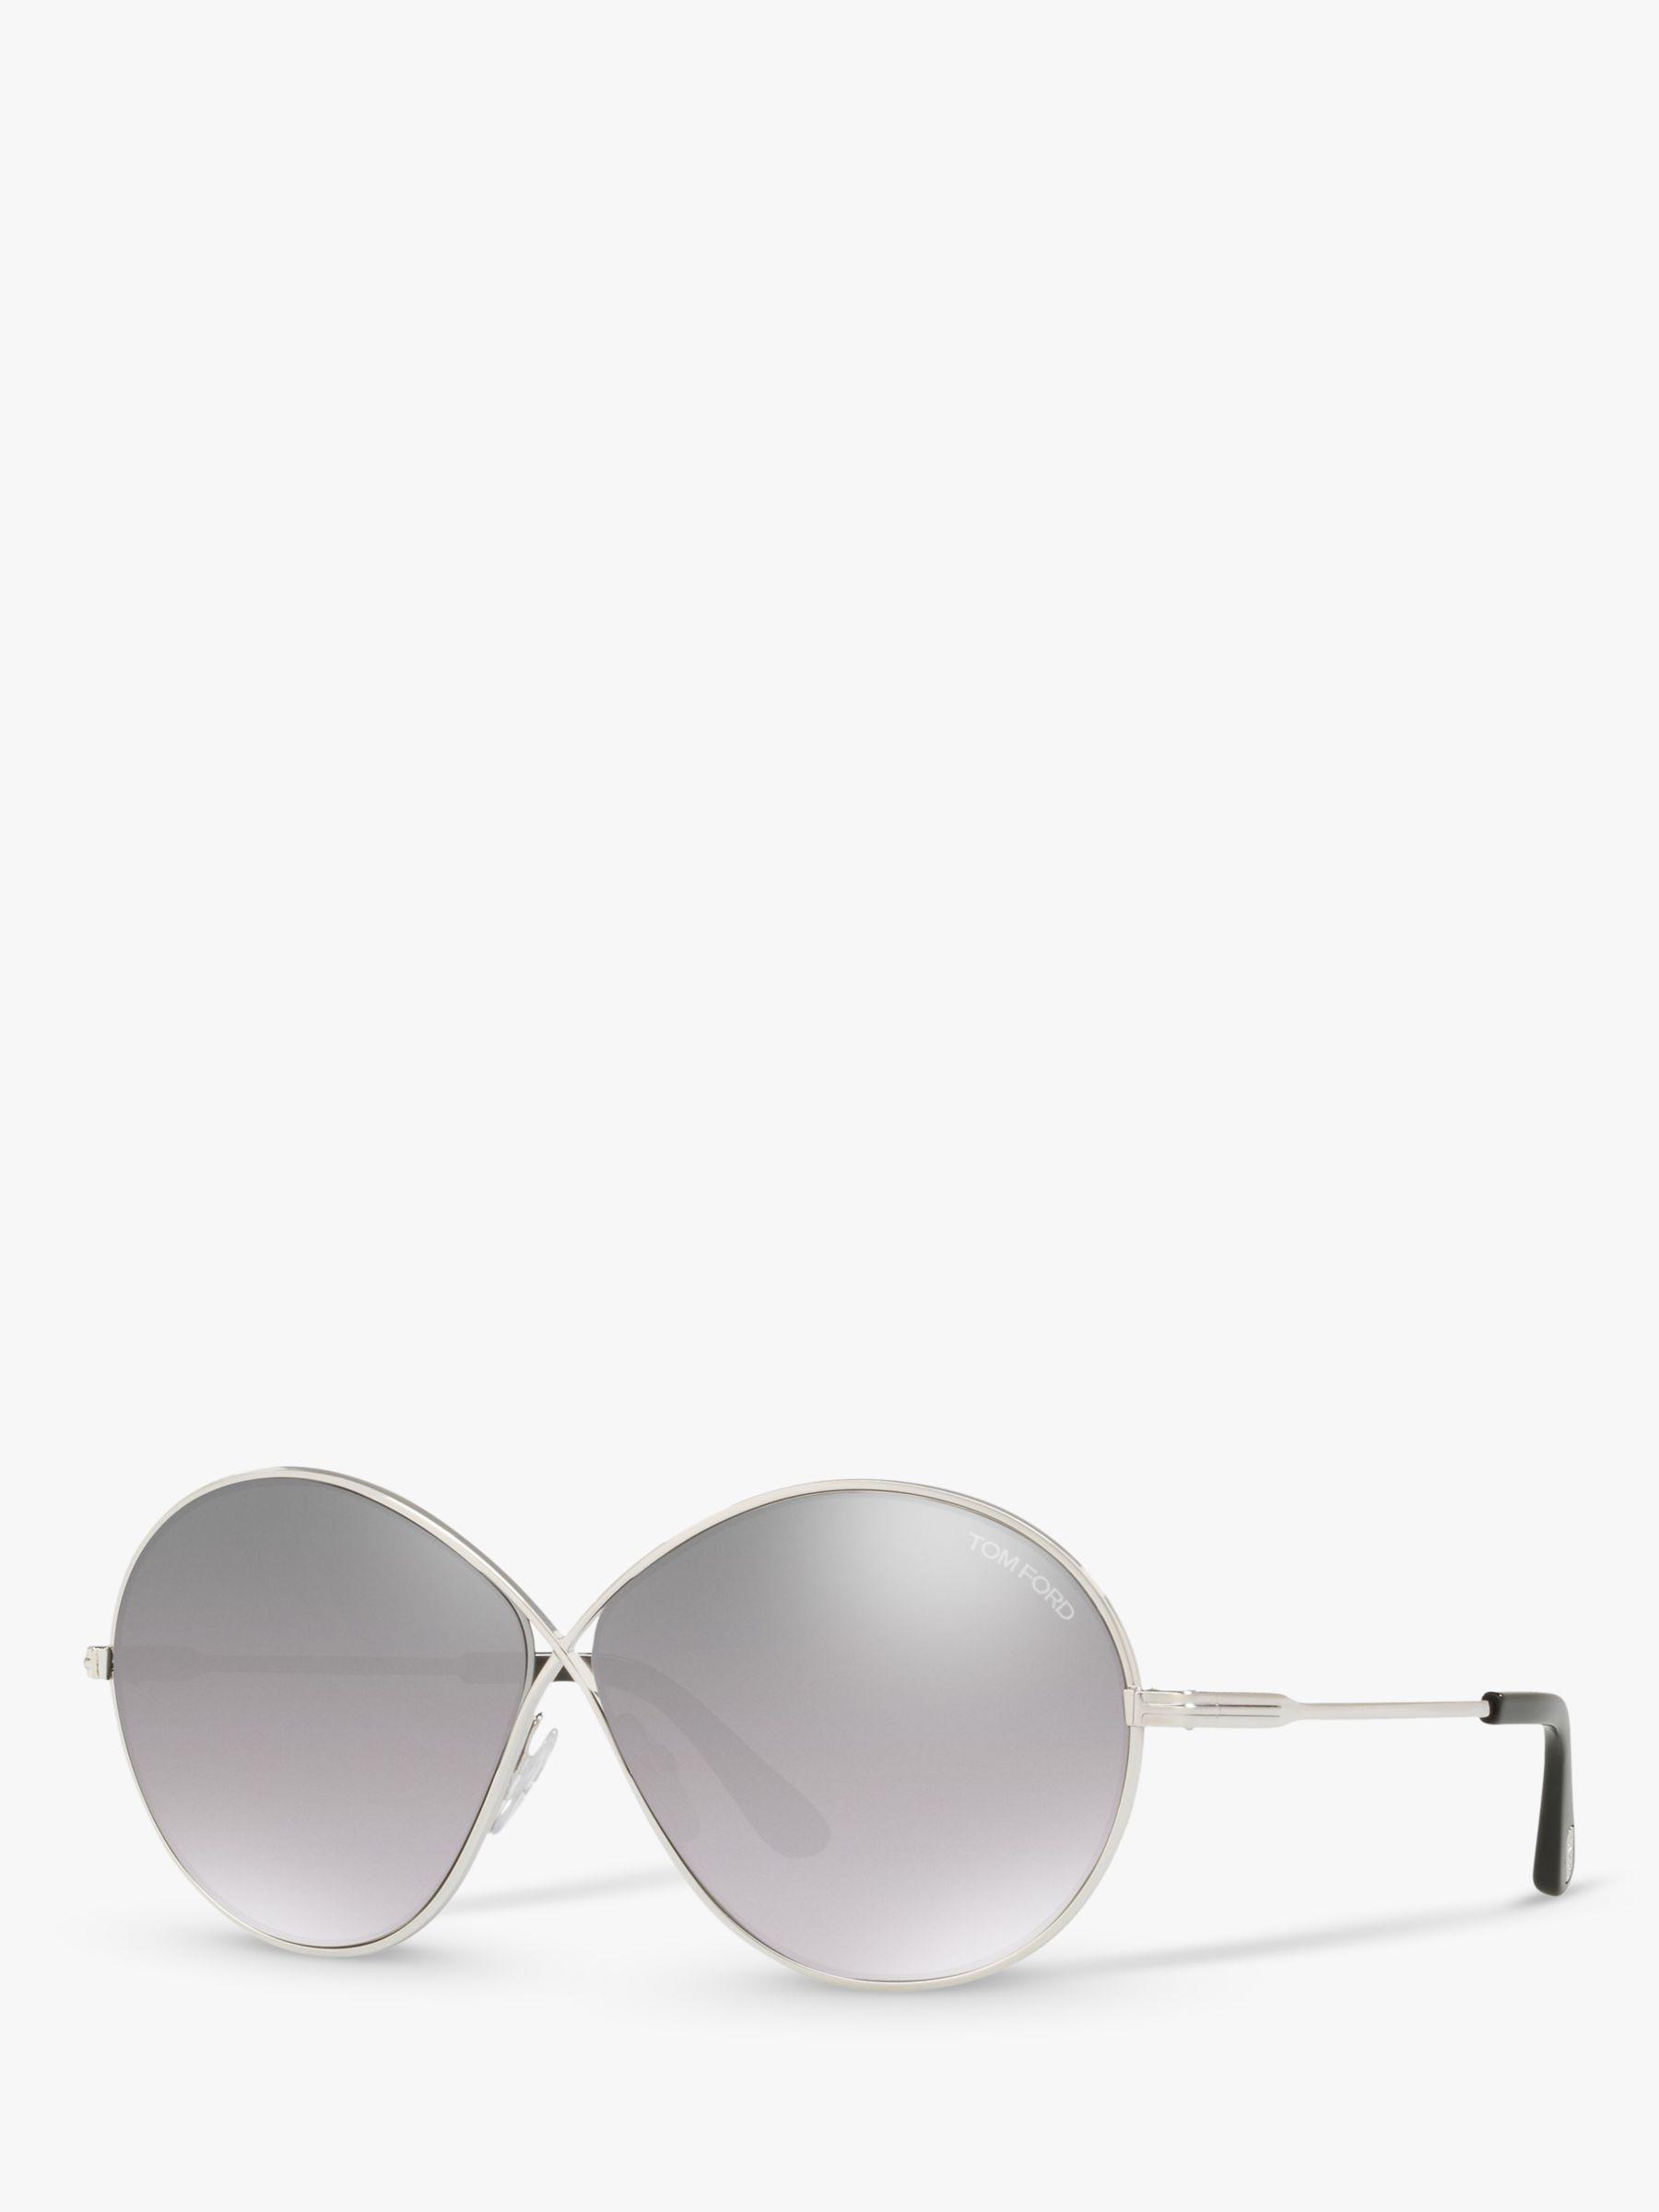 Tom Ford TOM FORD FT0564 Rania-02 Oval Sunglasses